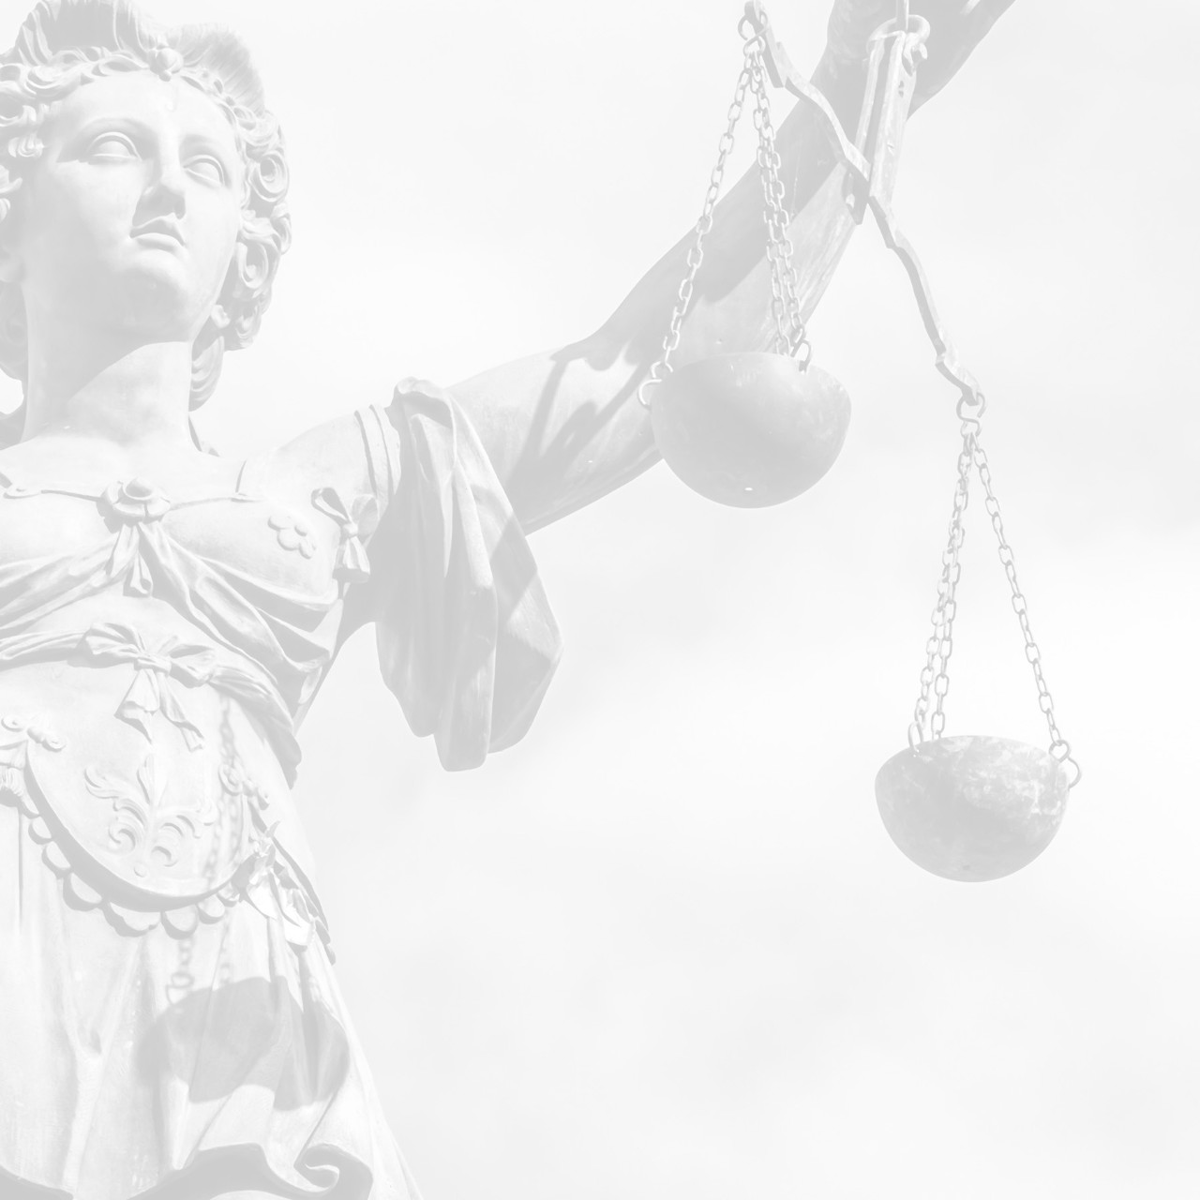 lady-justice-frankfurt